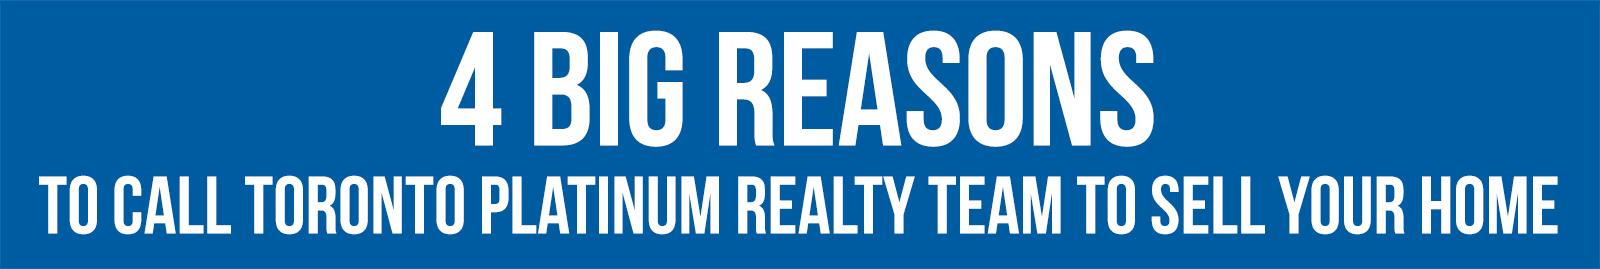 4 Reasons Banner.jpg